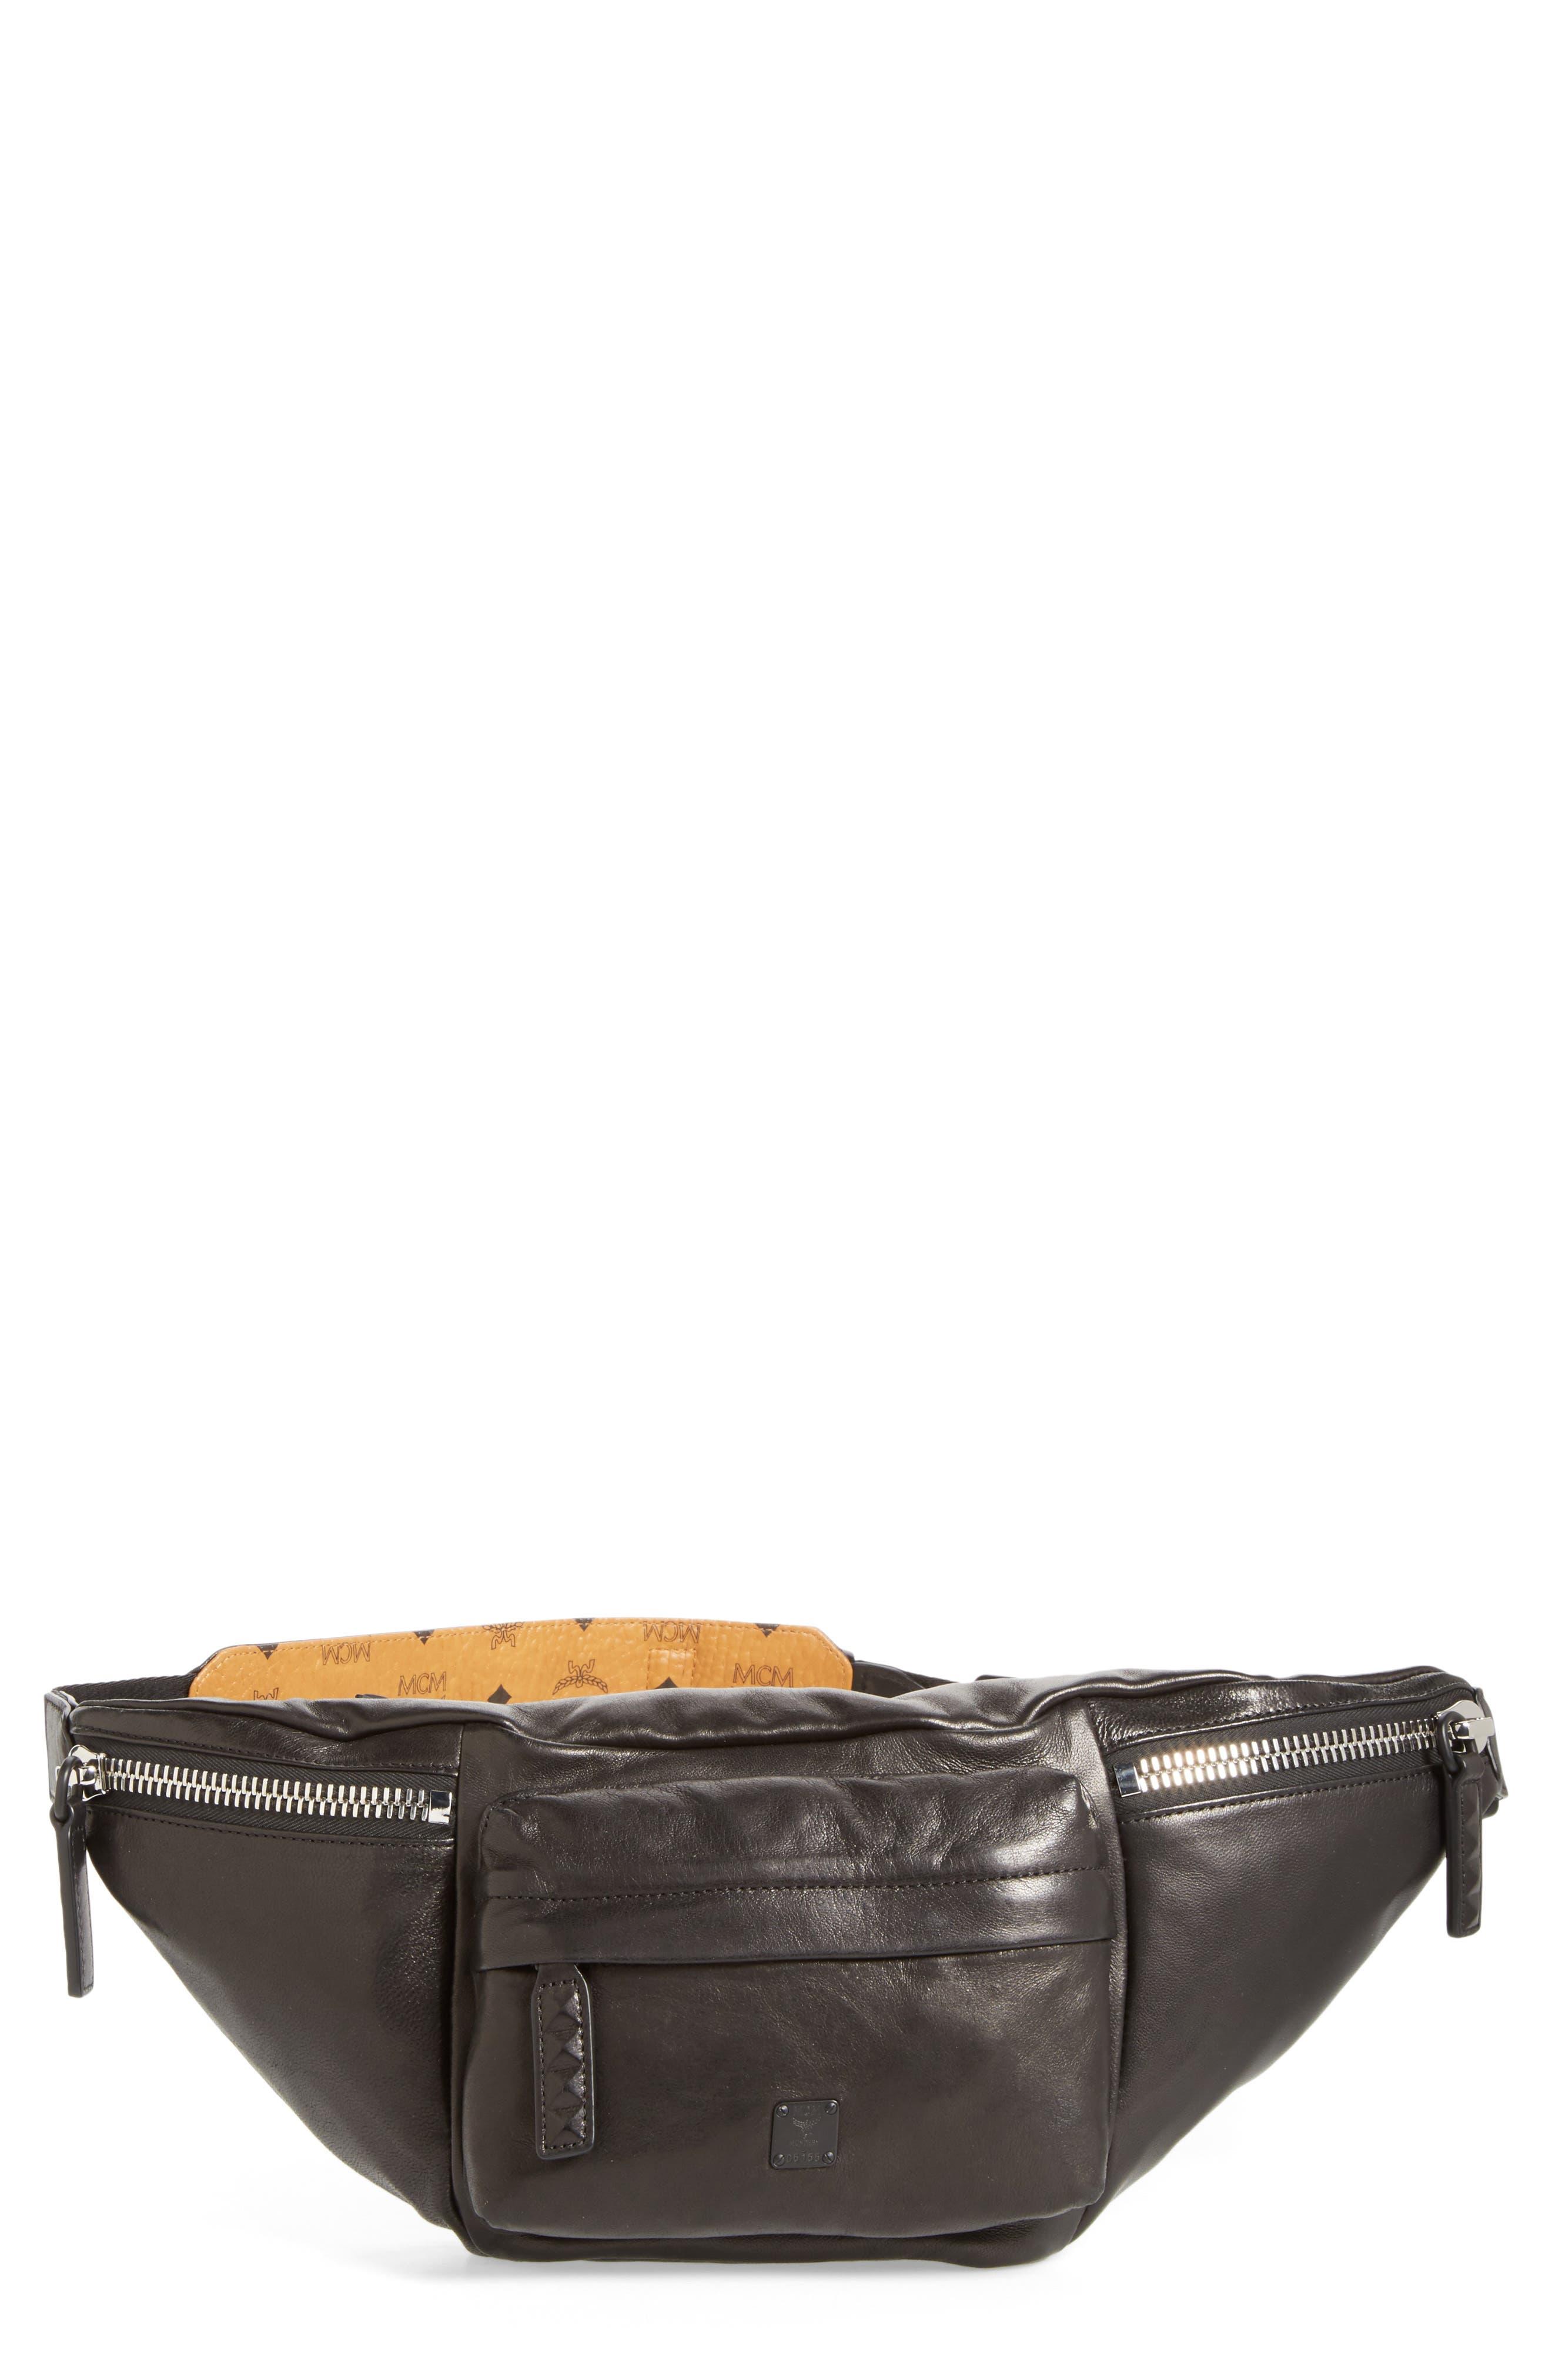 Alternate Image 1 Selected - MCM Leather Waist Bag